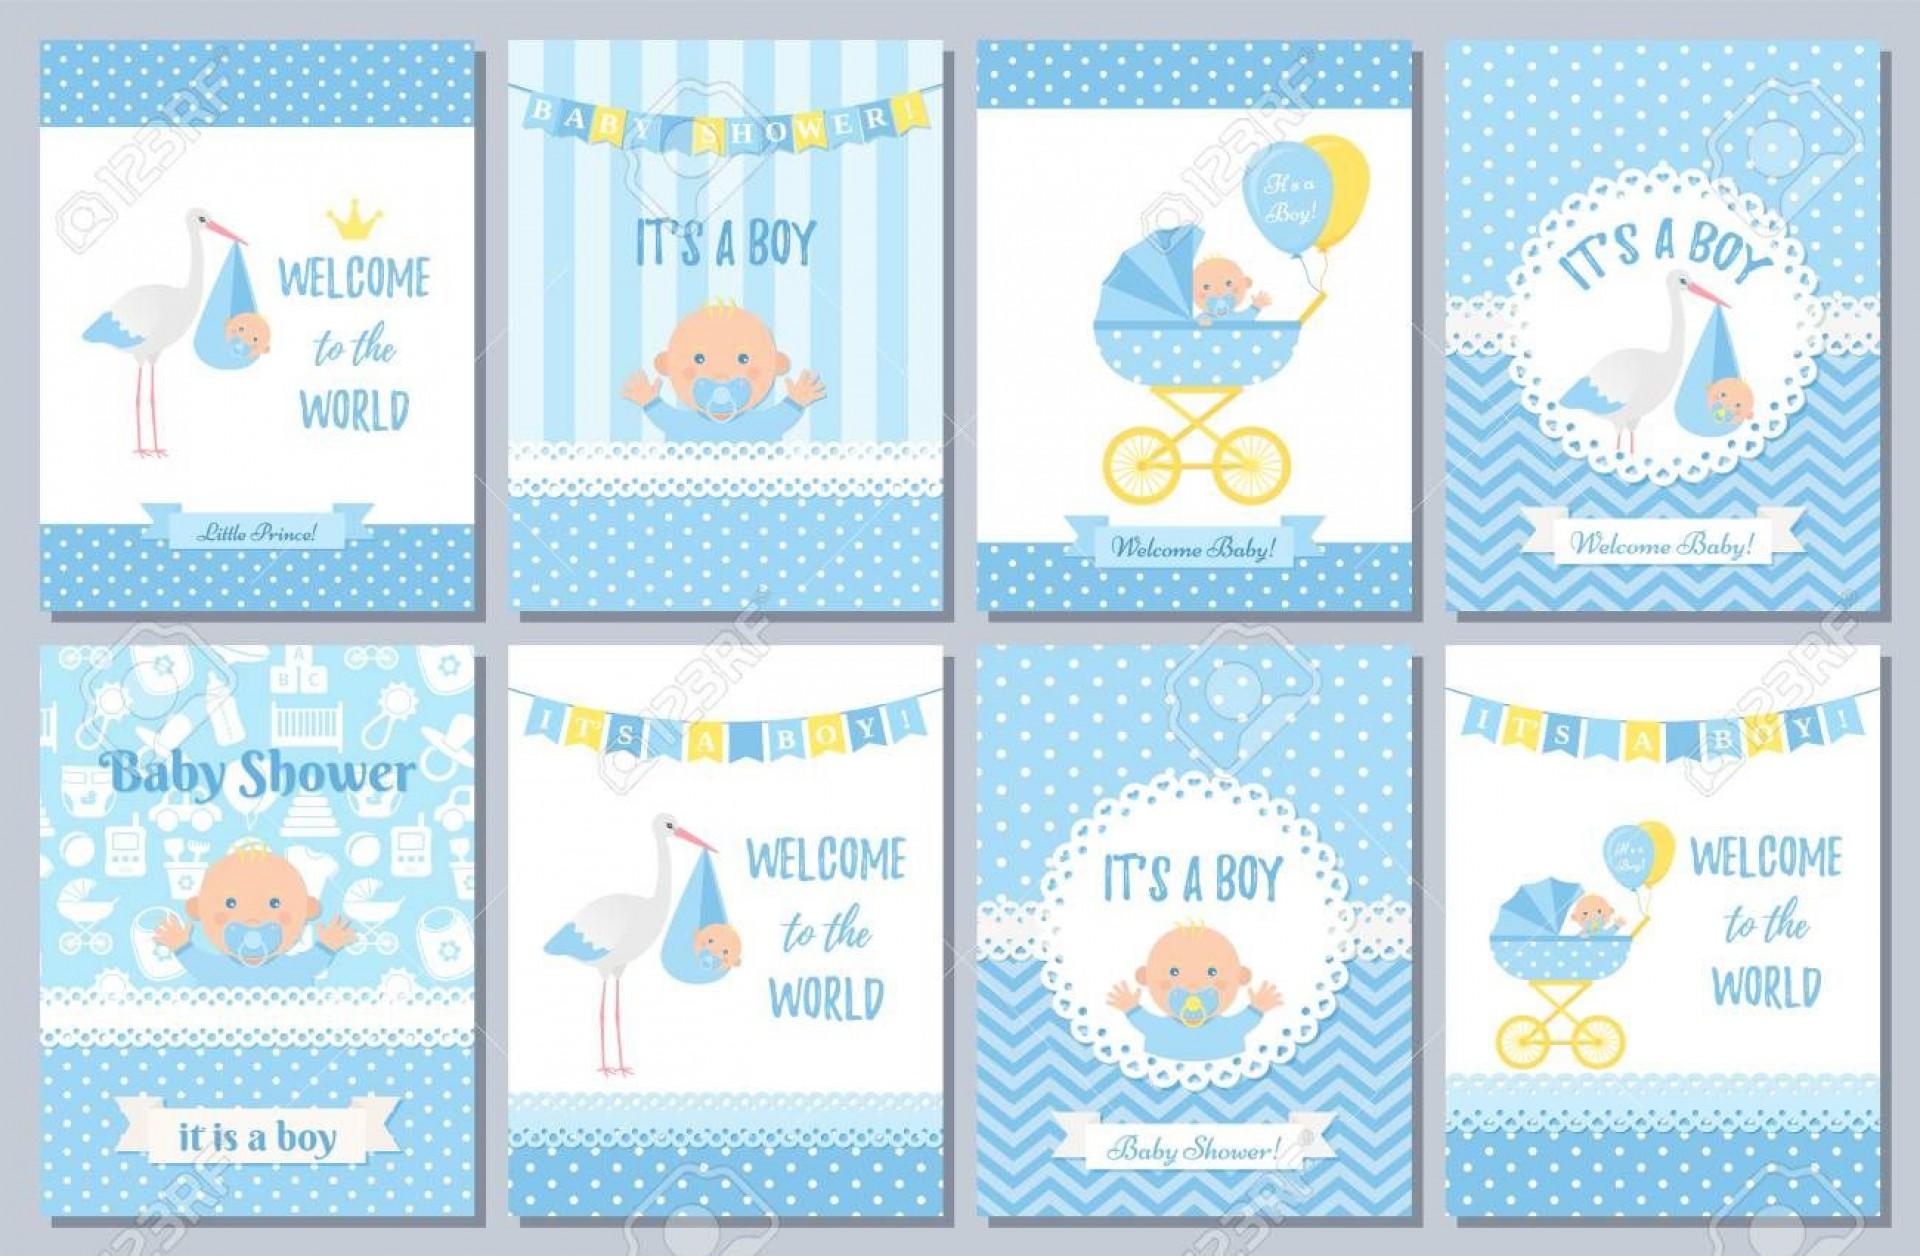 003 Dreaded Free Printable Baby Shower Card For Boy Highest Quality  Bingo1920